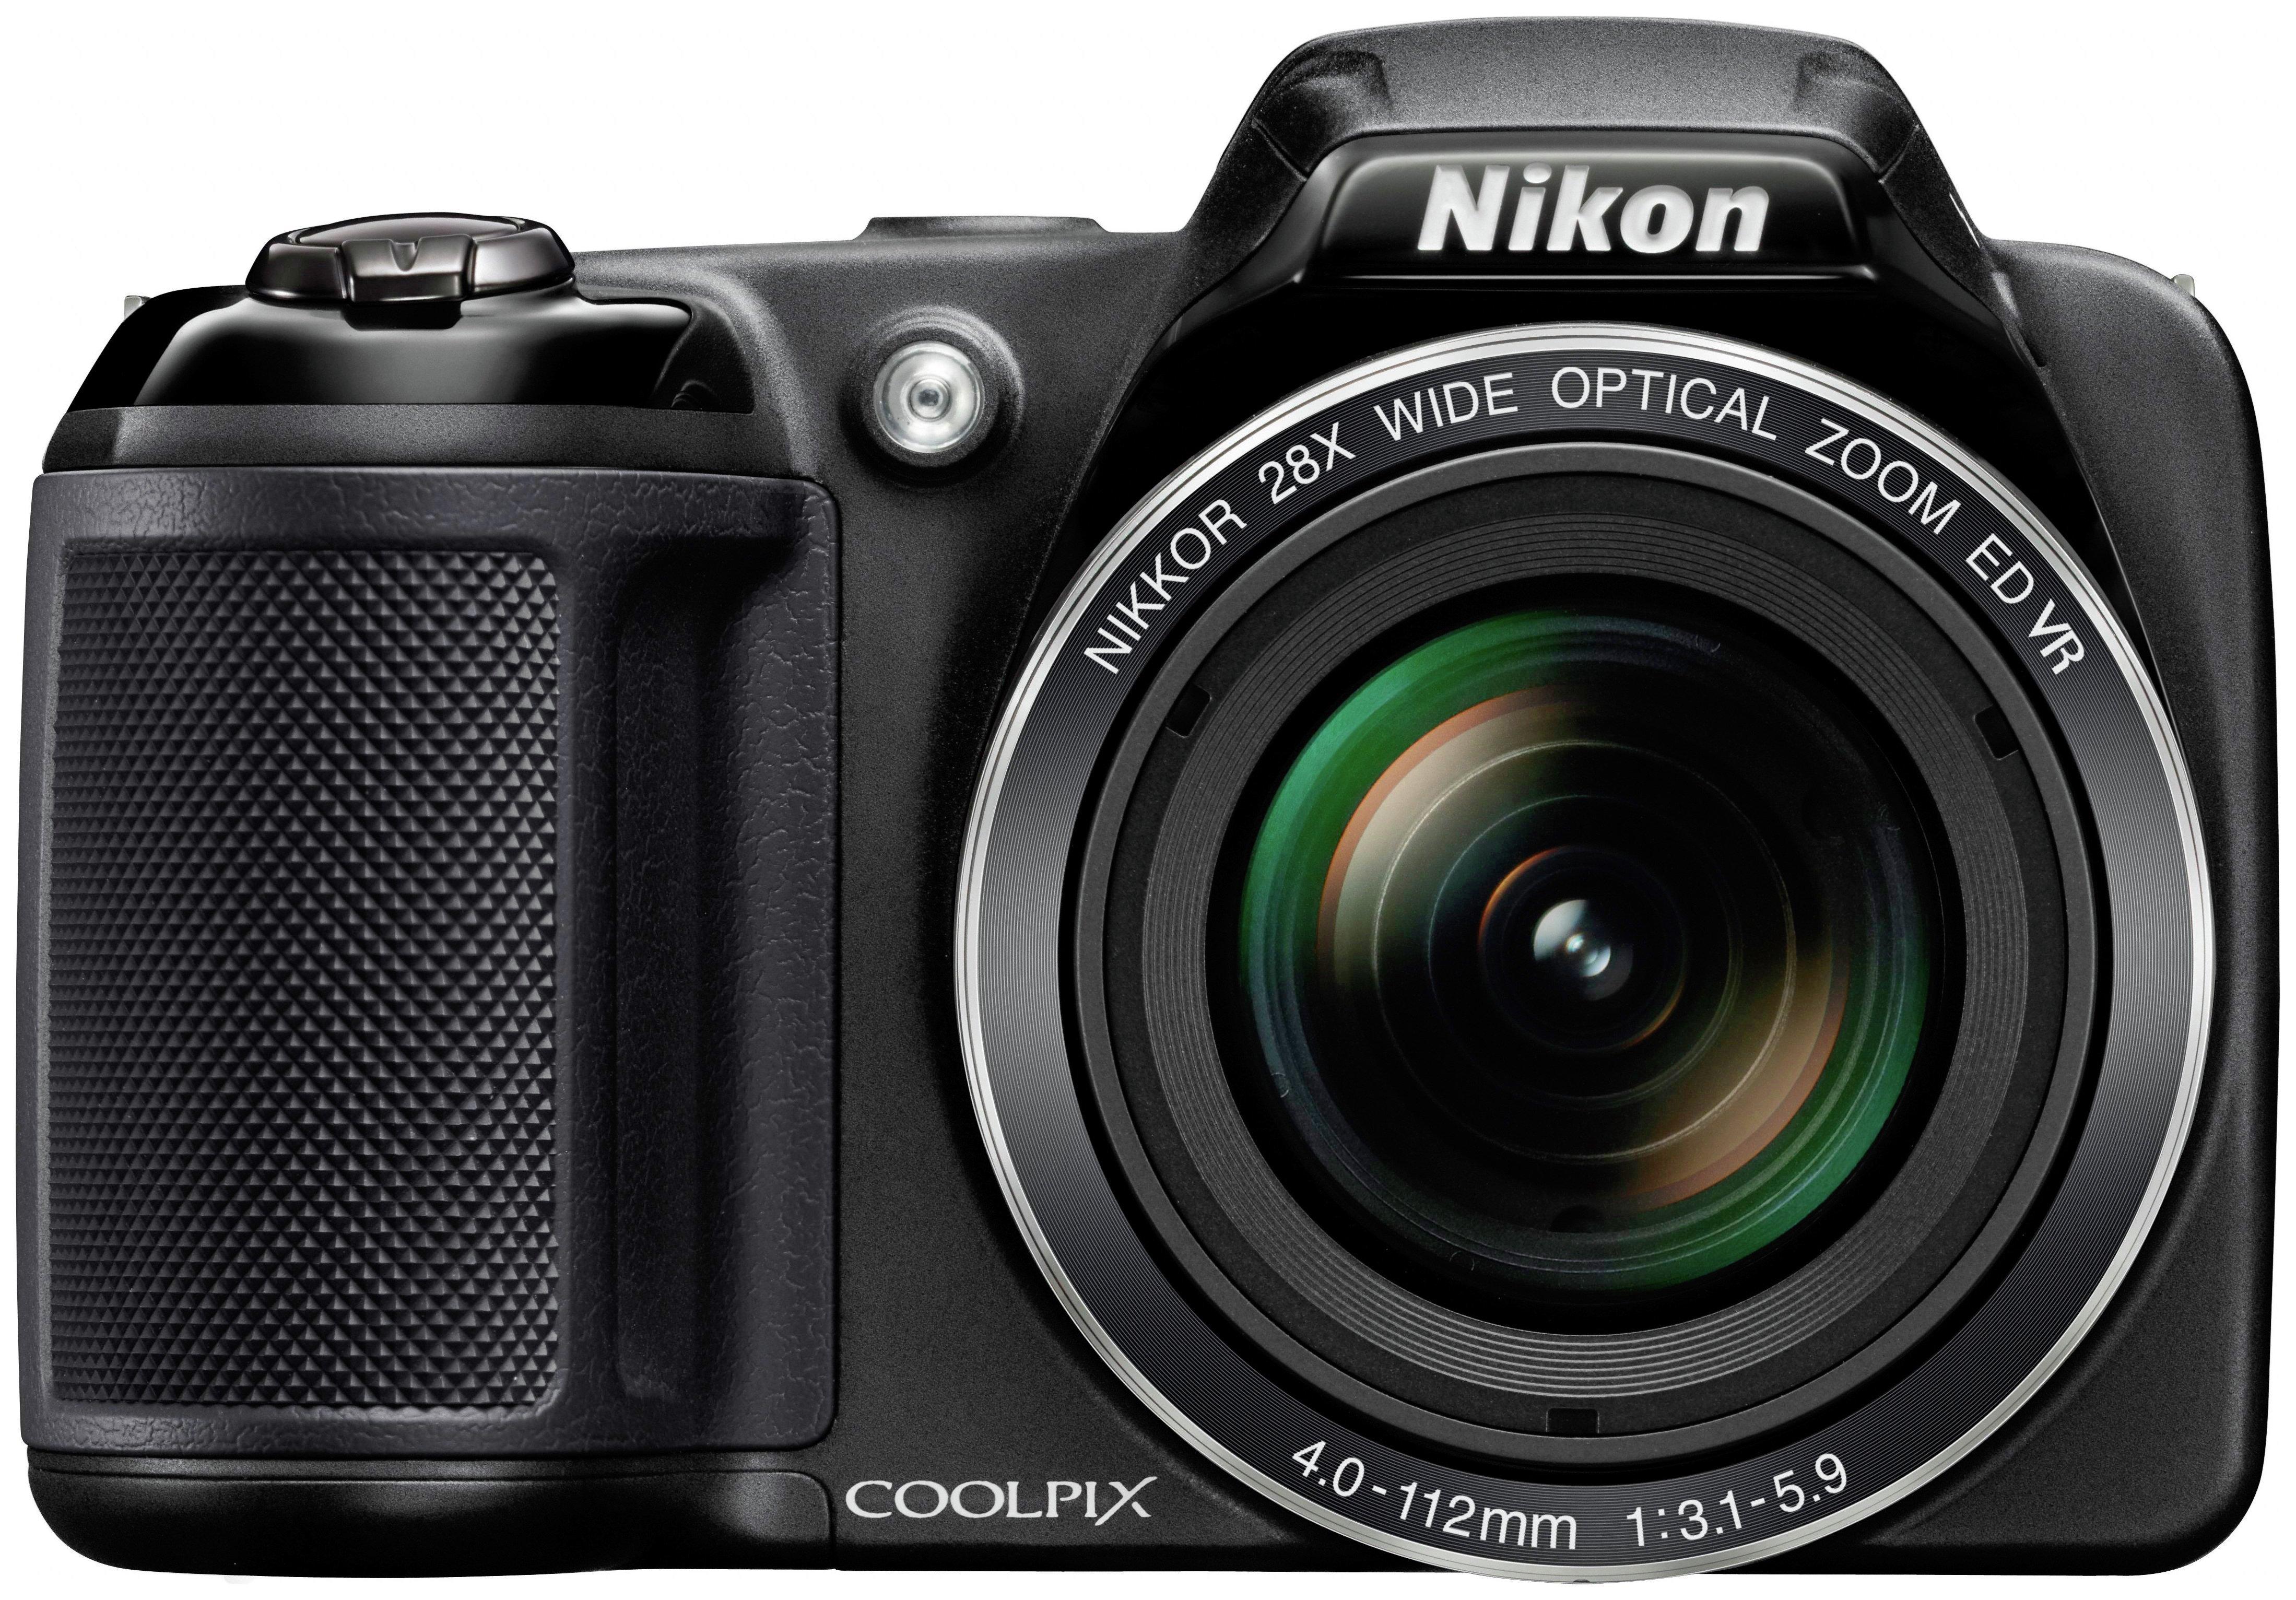 Camera Argos Dslr Cameras buy nikon coolpix l340 20mp 28x zoom bridge camera black at argos co uk your online shop for digital cameras came